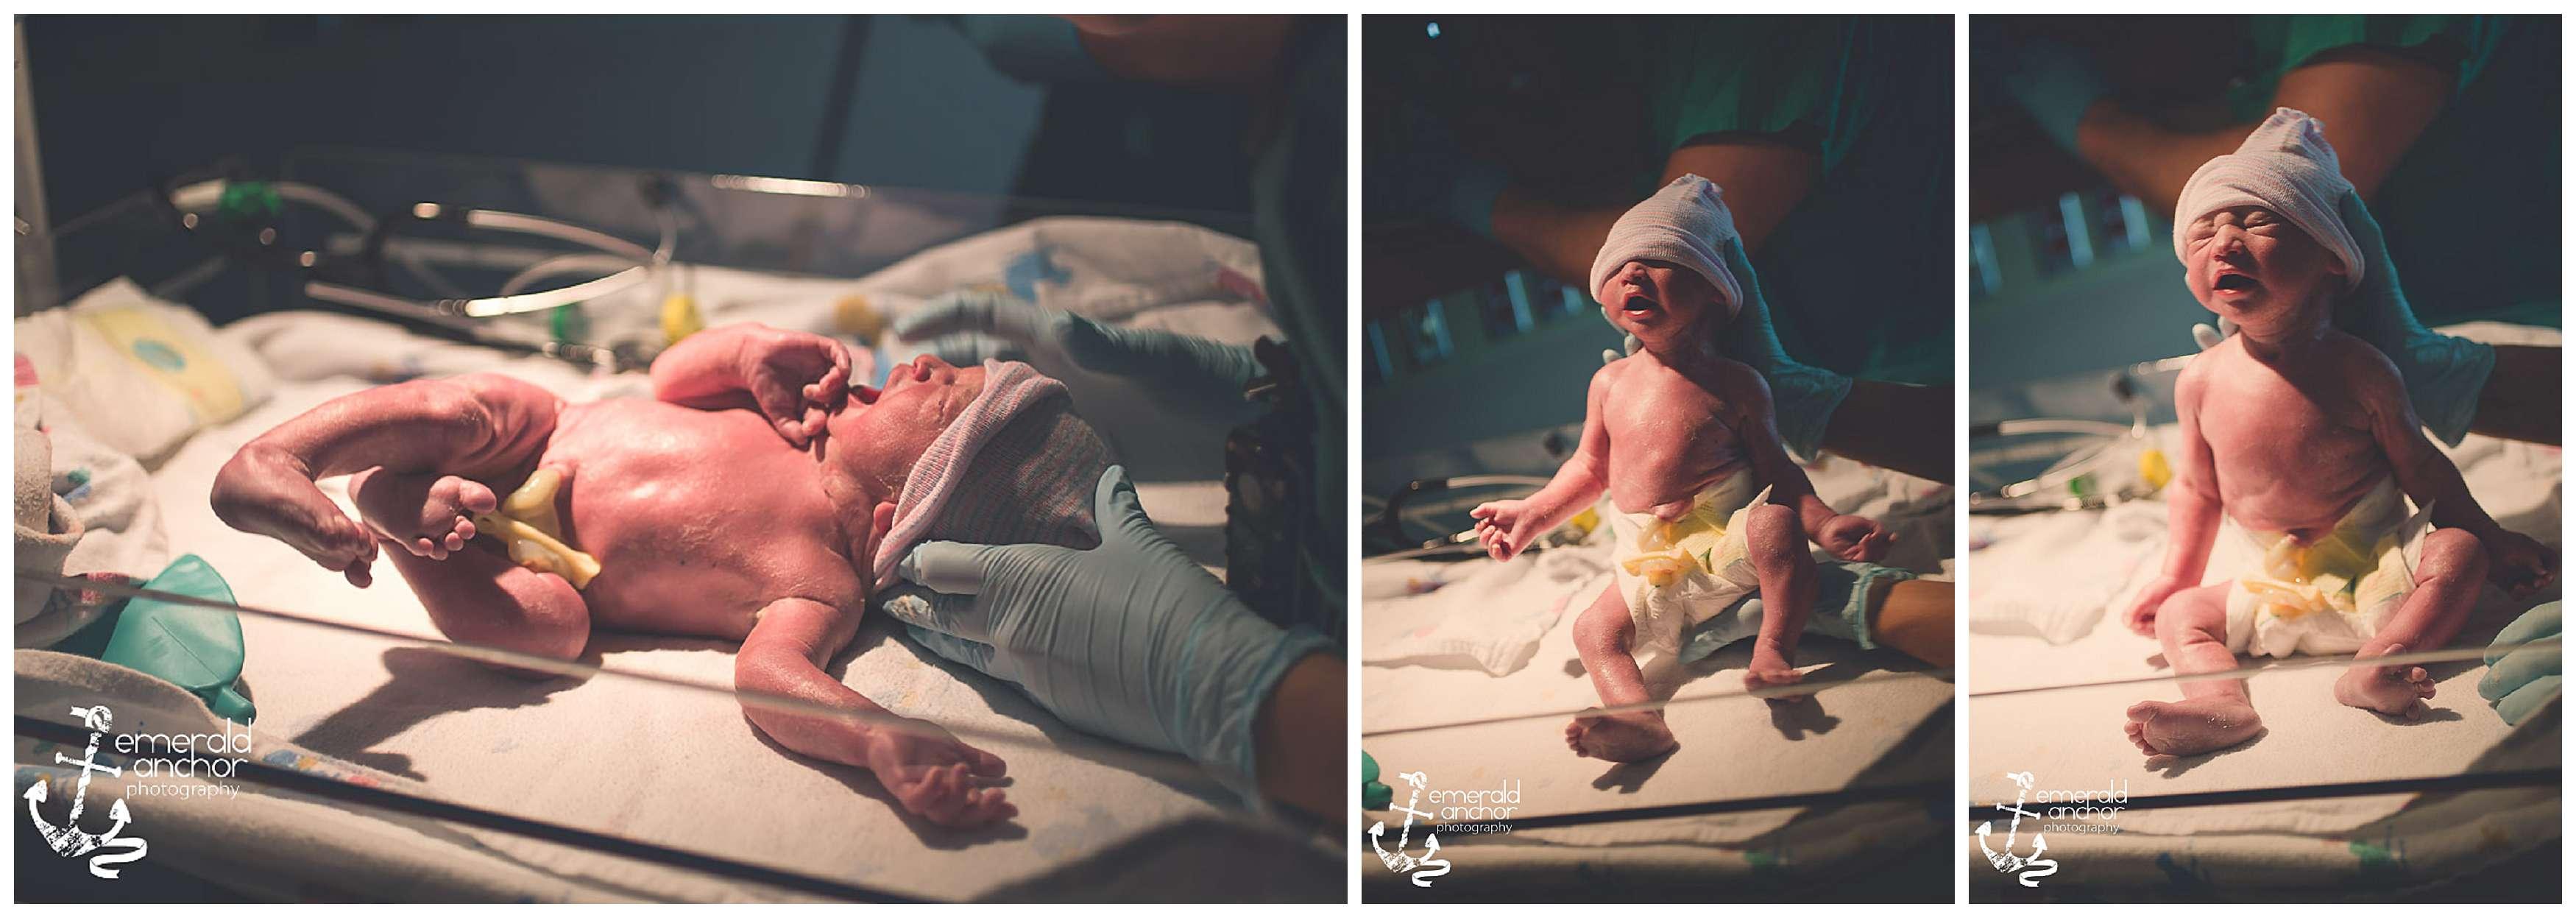 Emerald Anchor Photography Riverside Hospital Birth Story Photography Uriah Kade (61)